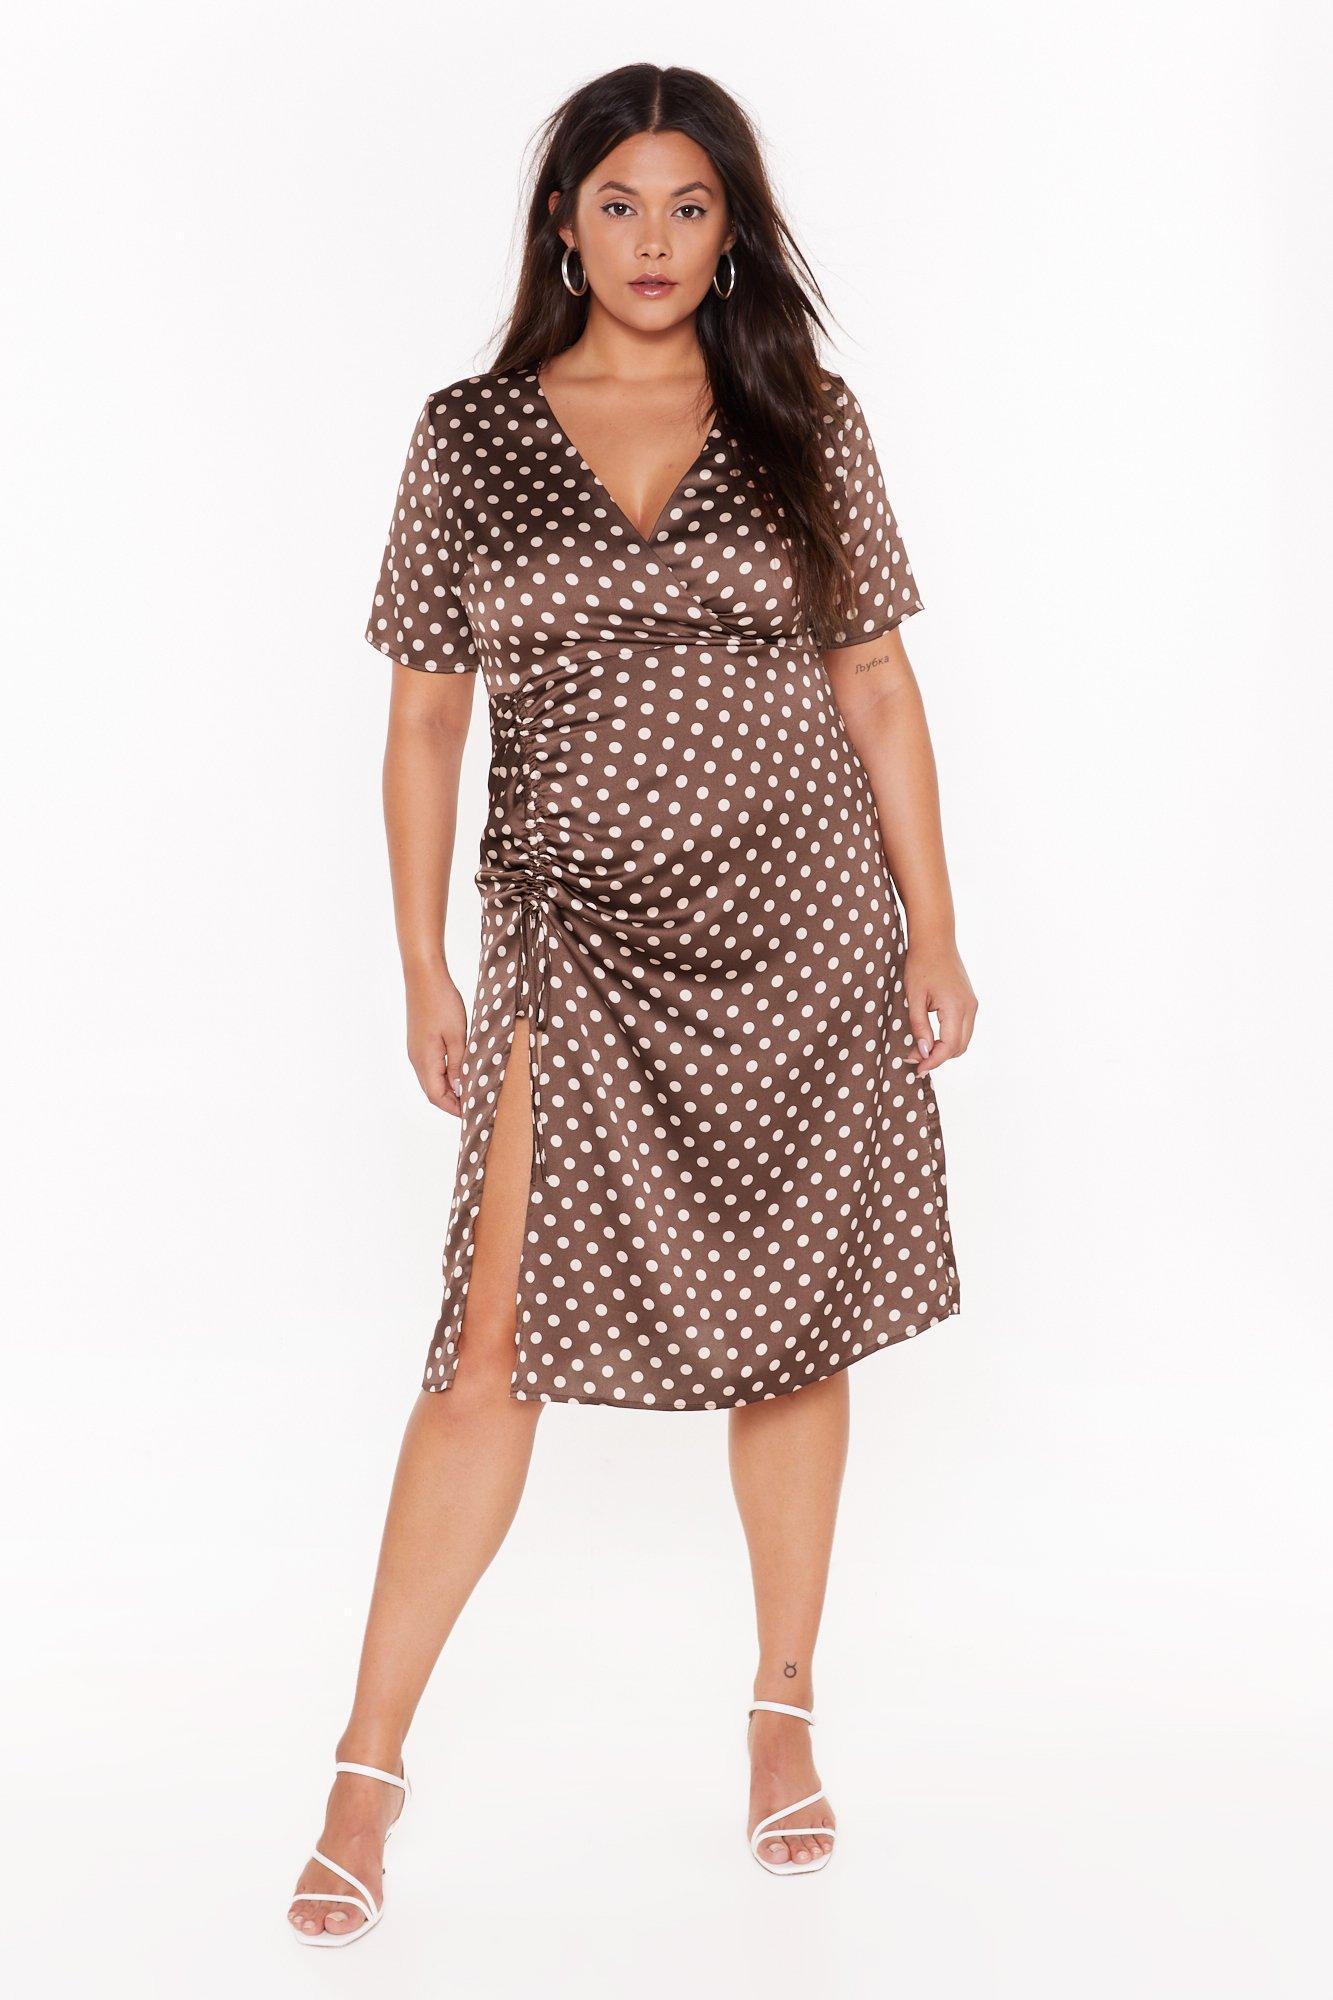 Dot Happy For You Plus Satin Dress 6